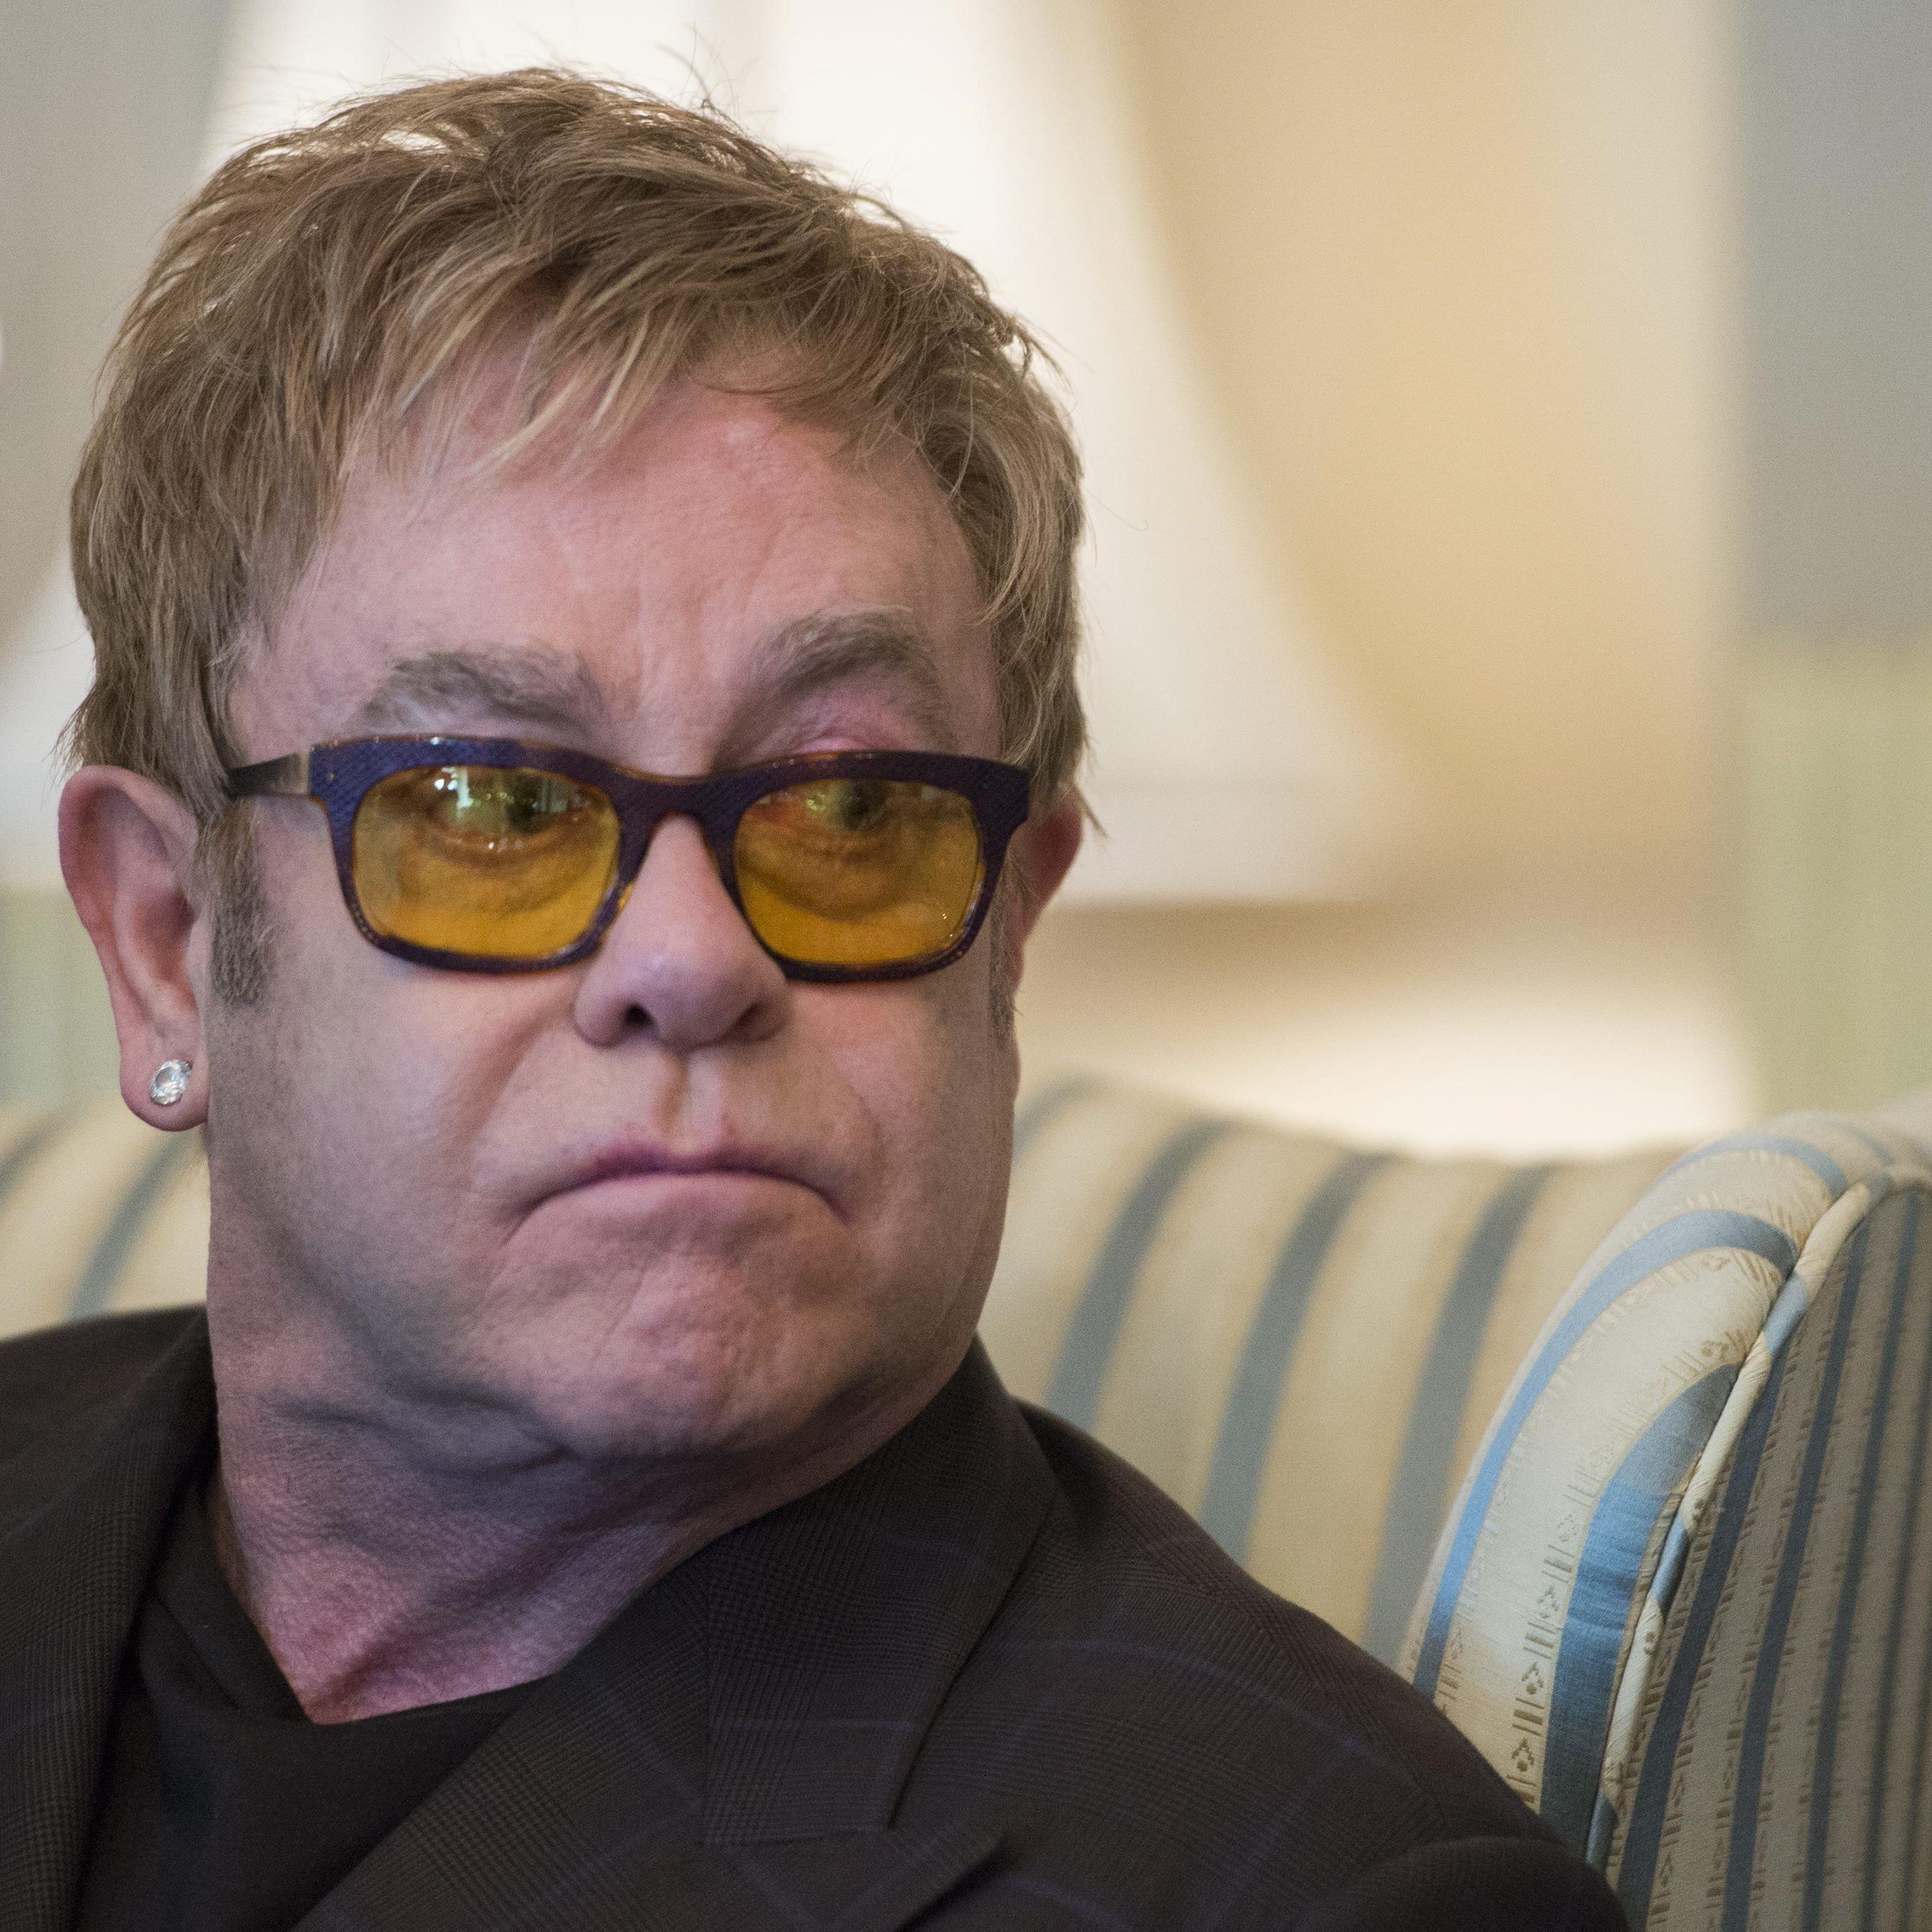 Elton John kippt mit Stuhl um: Video hatte binnen Stunden 1 Mio. Klicks.